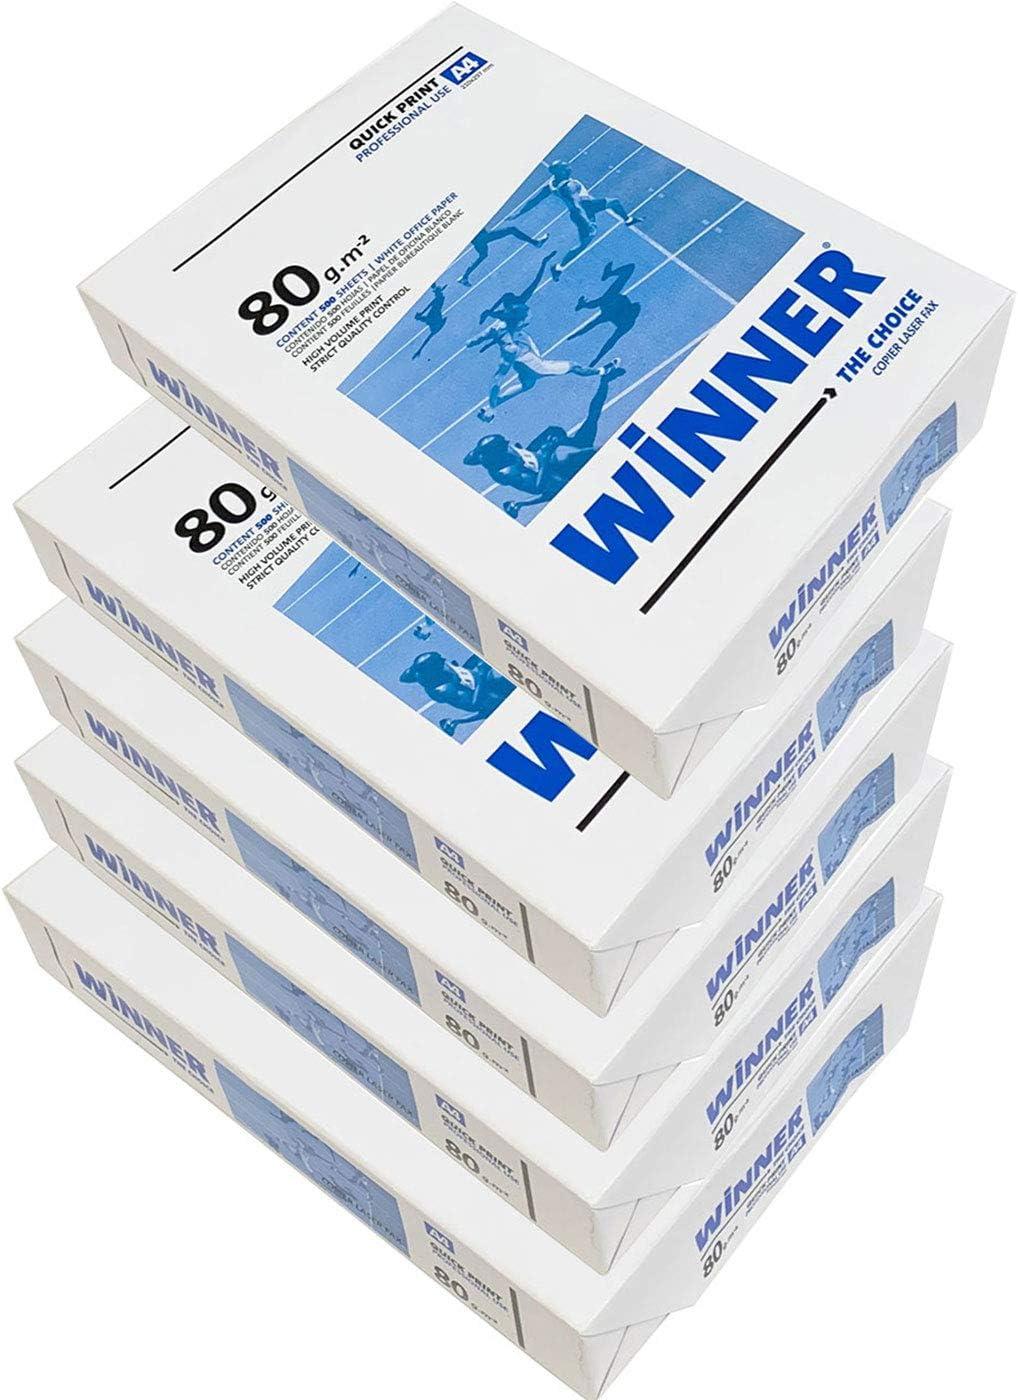 WINNER -Caja 5 Paquetes de 500 Folios 2500 Hojas de A-4 80g ...